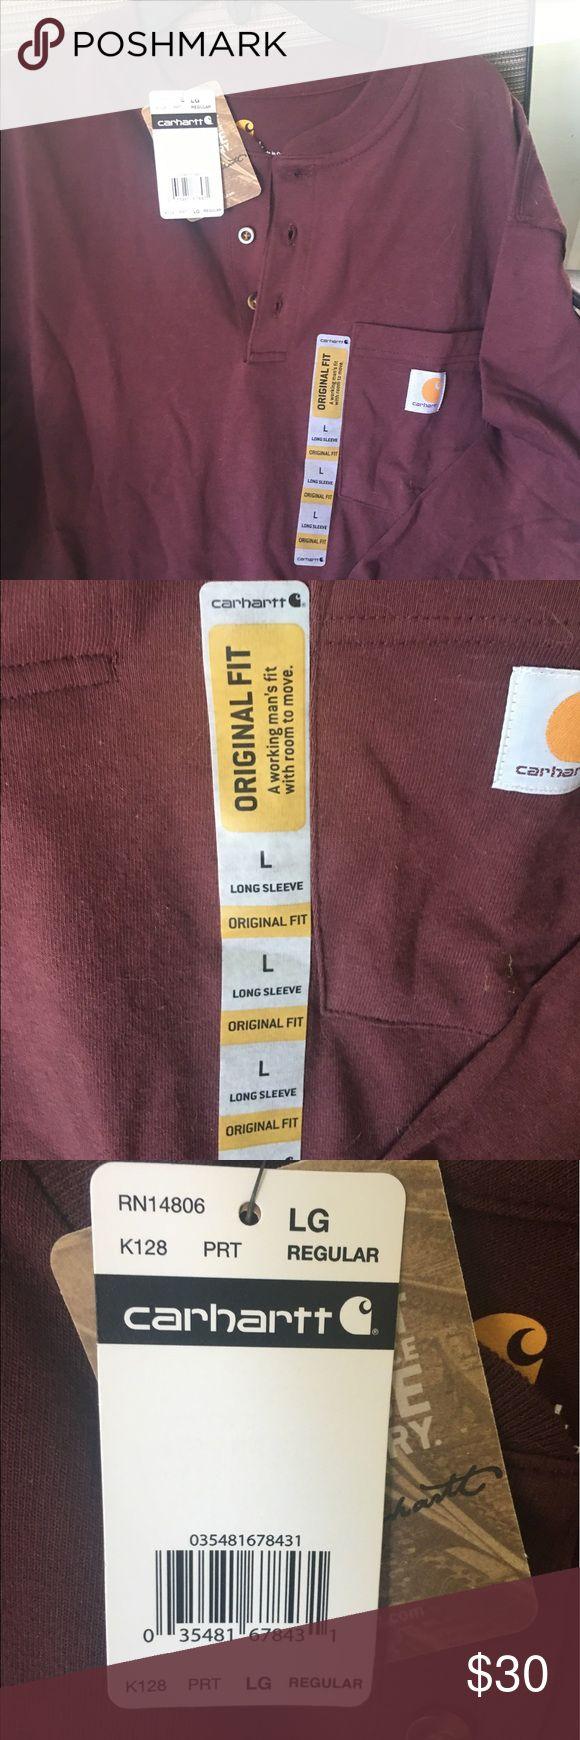 Carhartt long sleeve Henley New color is port. A burgundy purple color Carhartt Shirts Tees - Long Sleeve